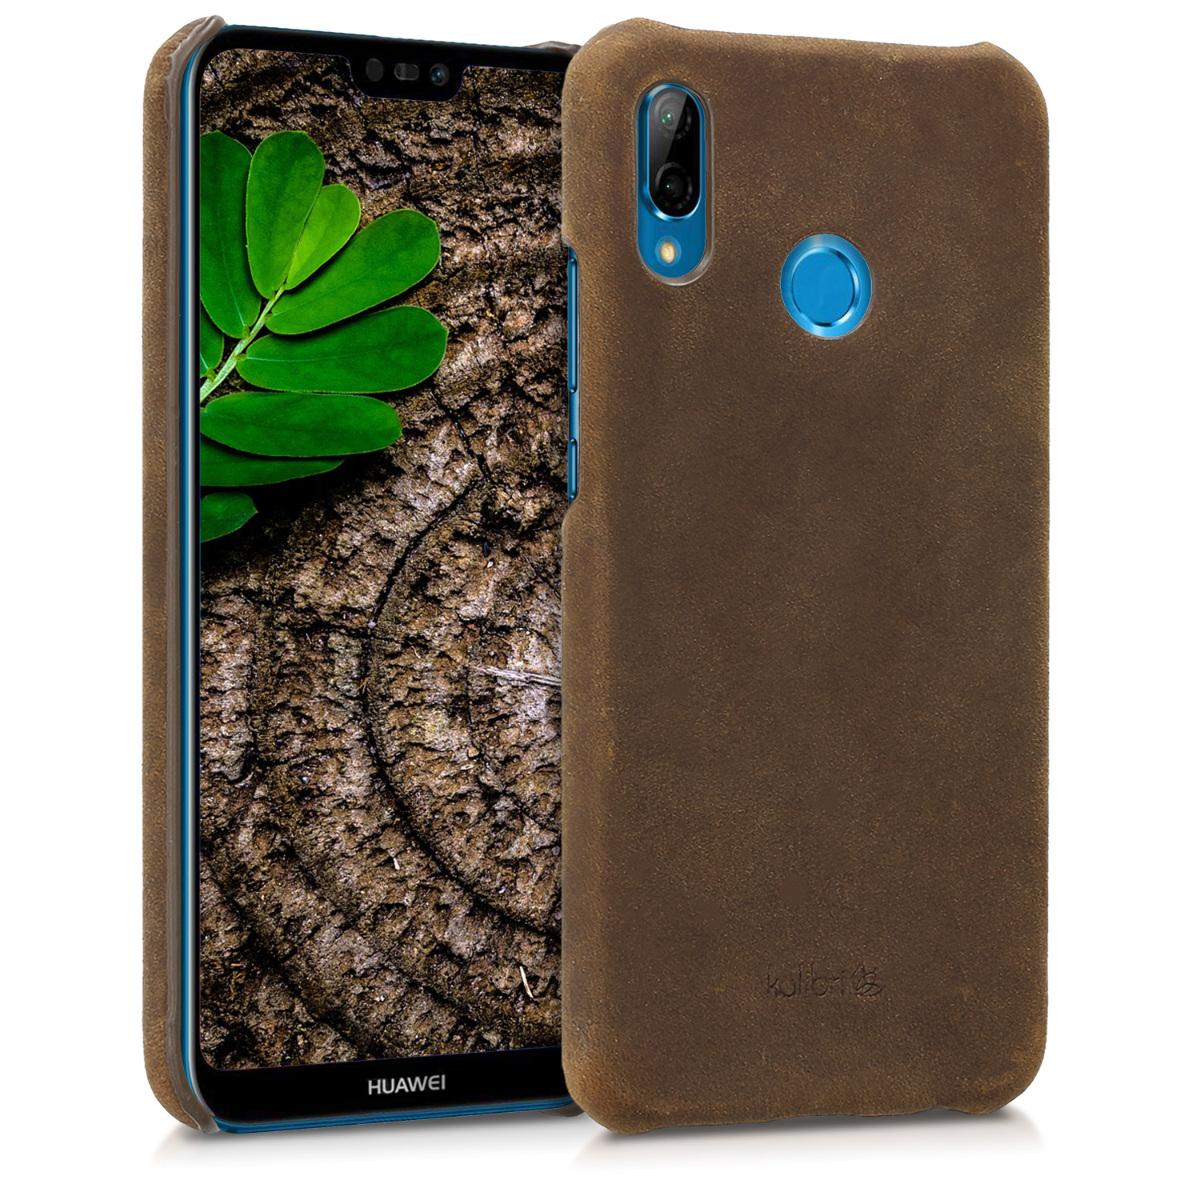 Kalibri Σκληρή Δερμάτινη Θήκη Huawei P20 Lite - Brown (44892.05)